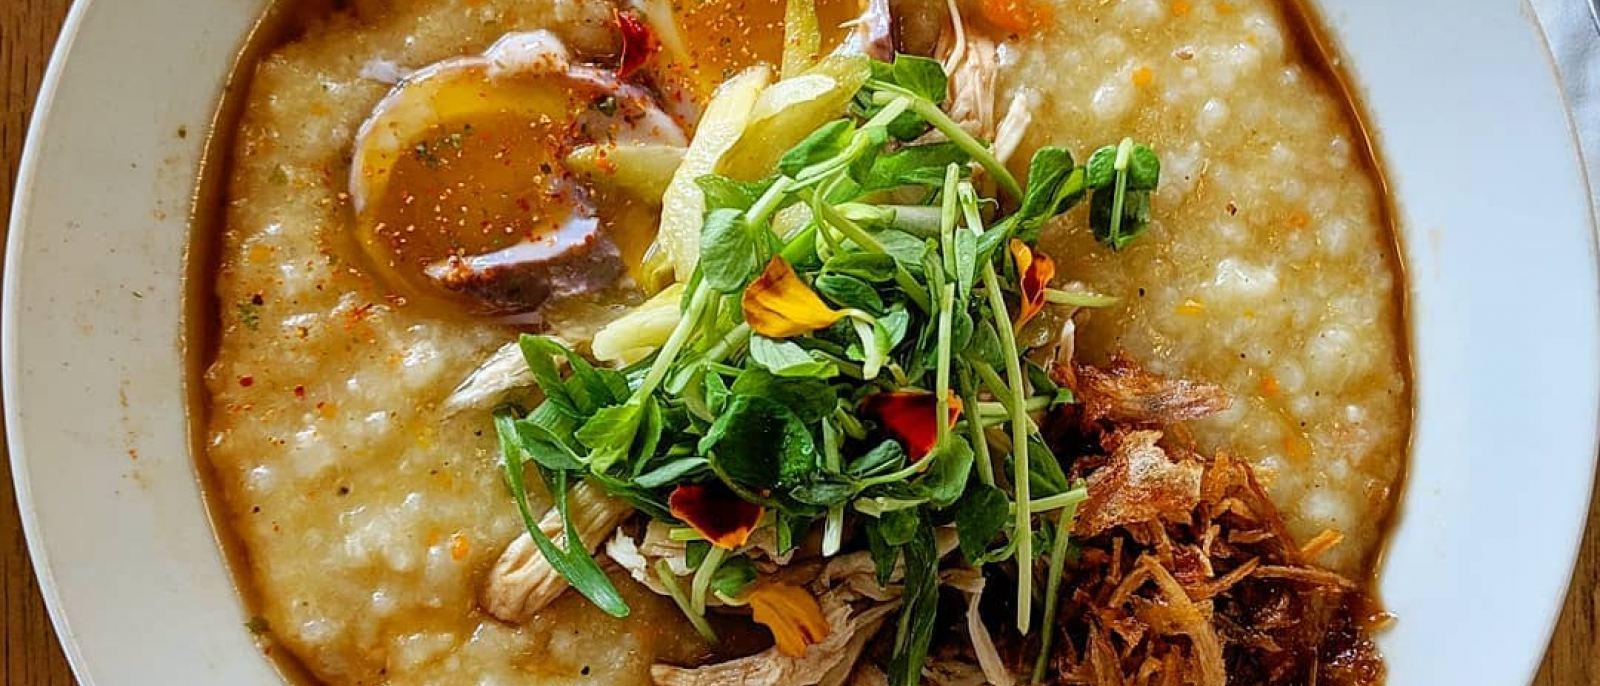 Poultry + Mushroom Porridge at porridge + puffs in Historic Filipinotown